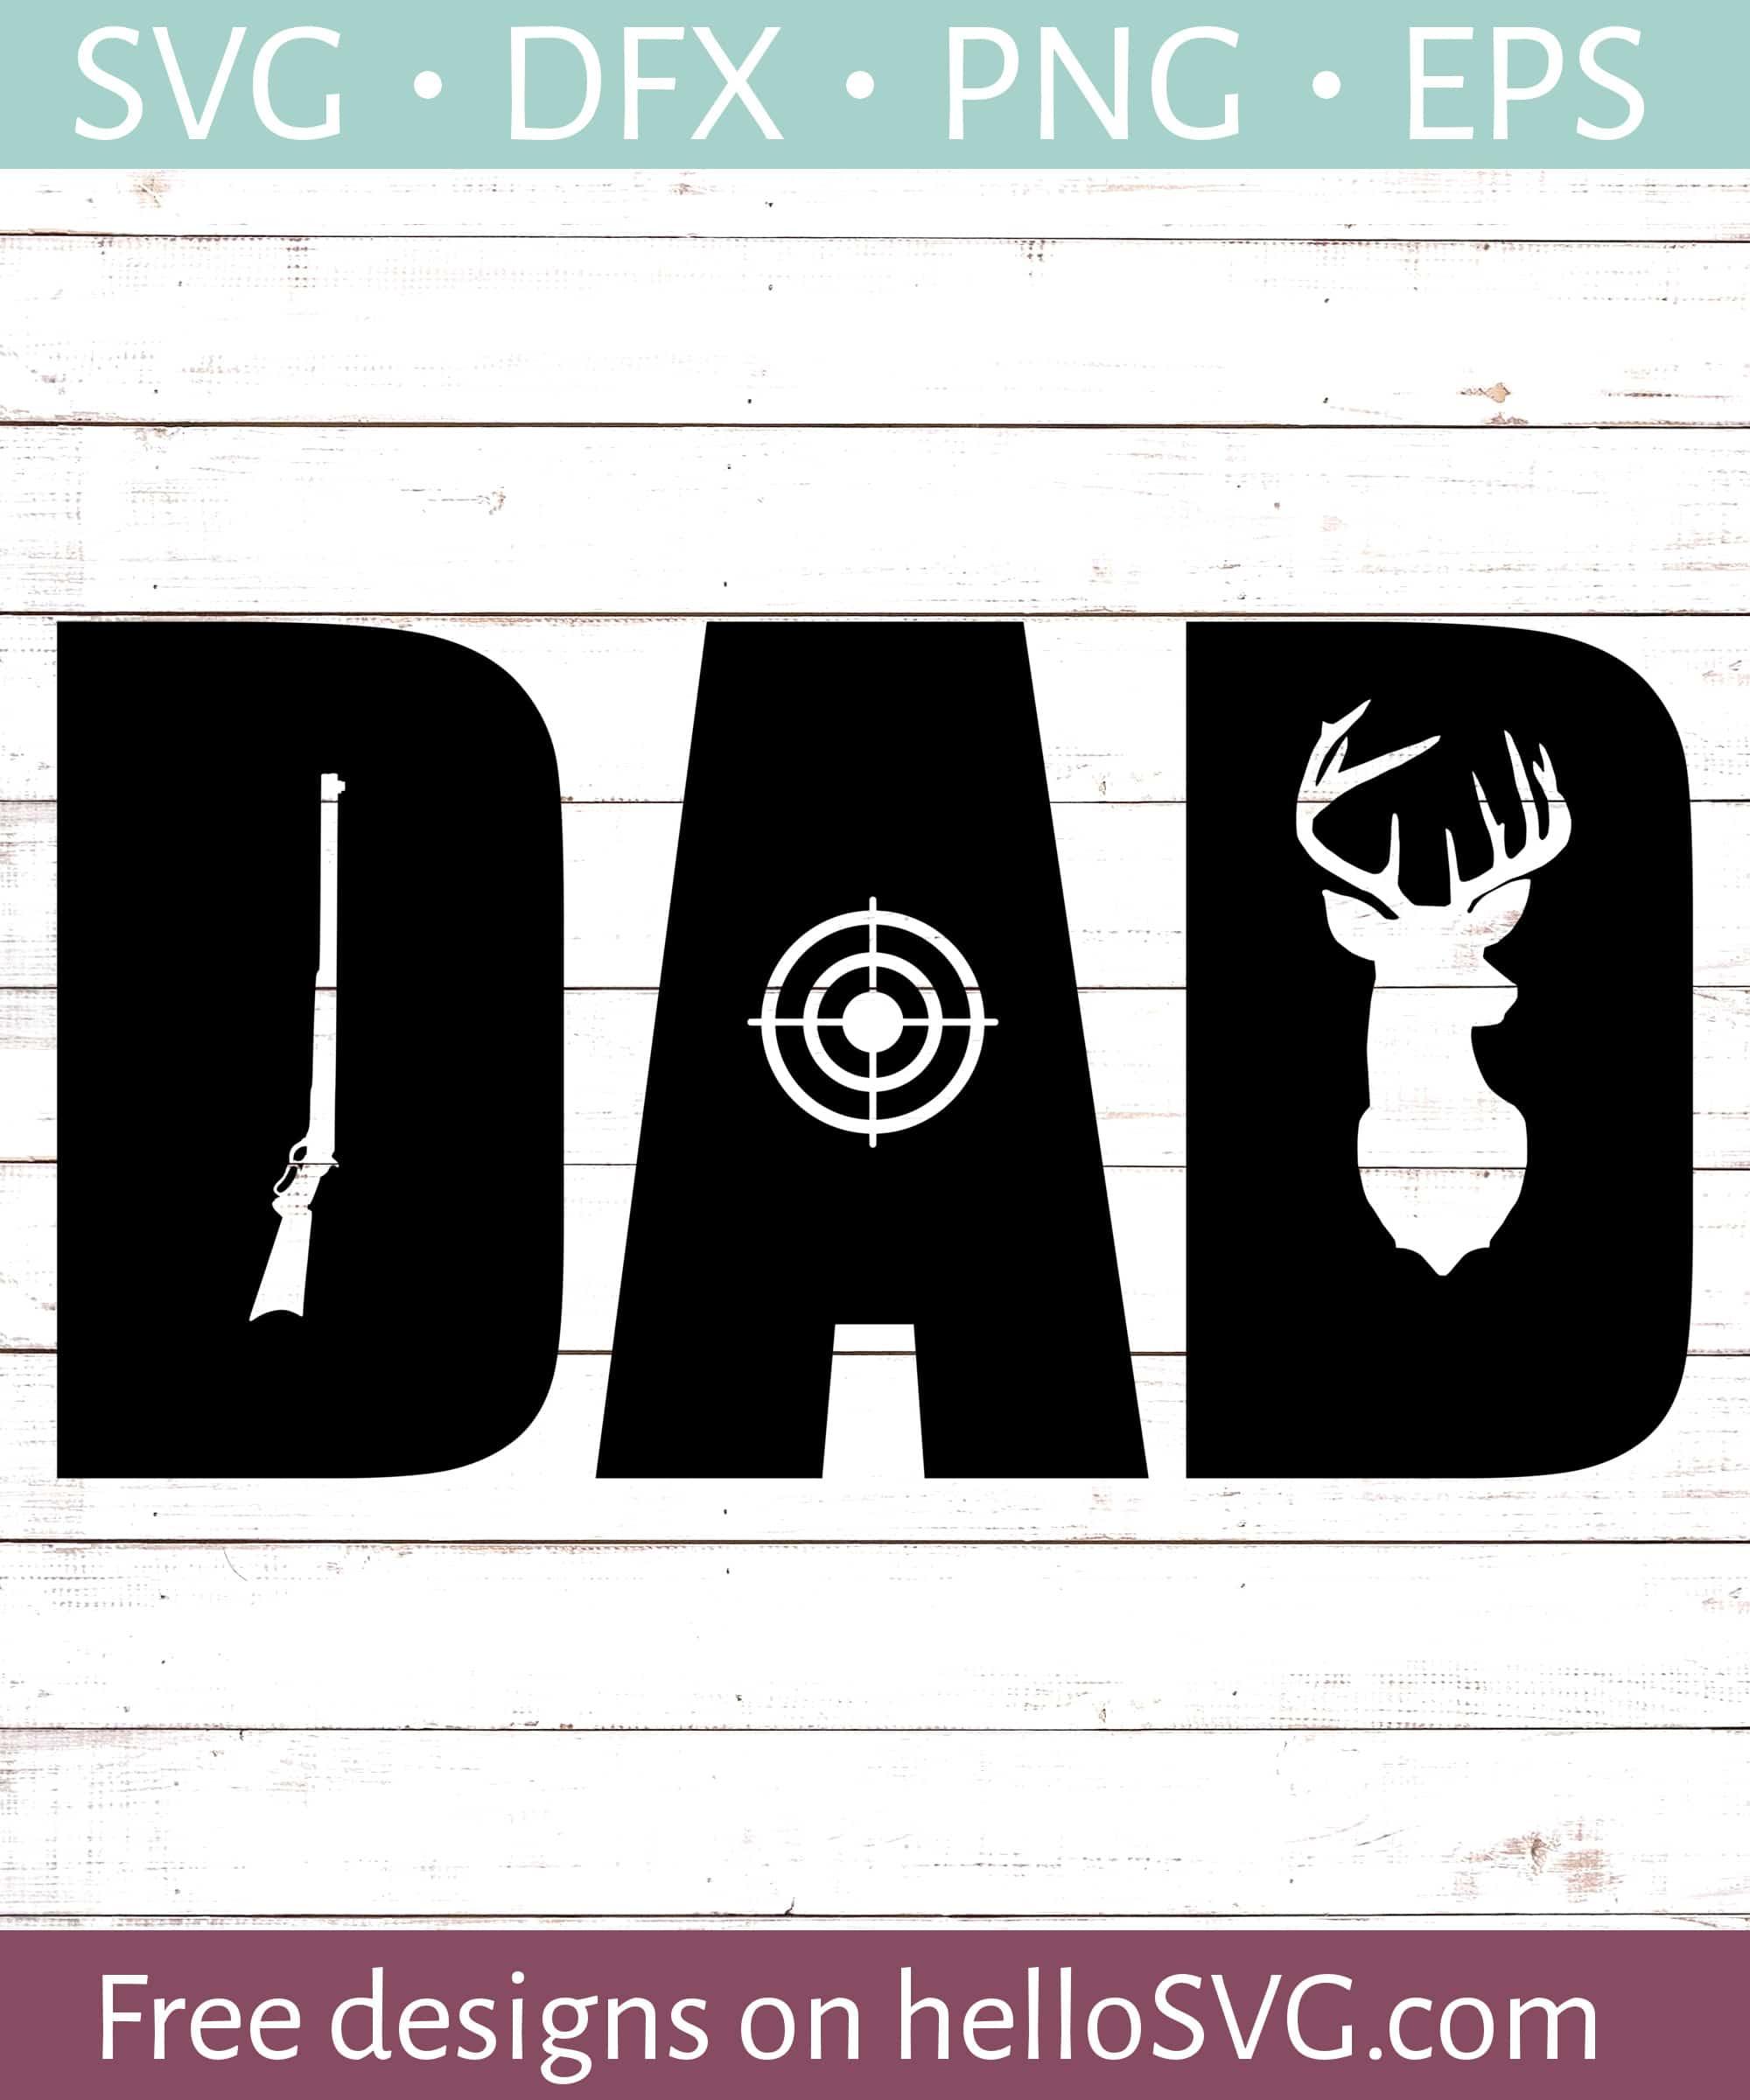 Hunting Dad Svg Free Svg Files Hellosvg Com